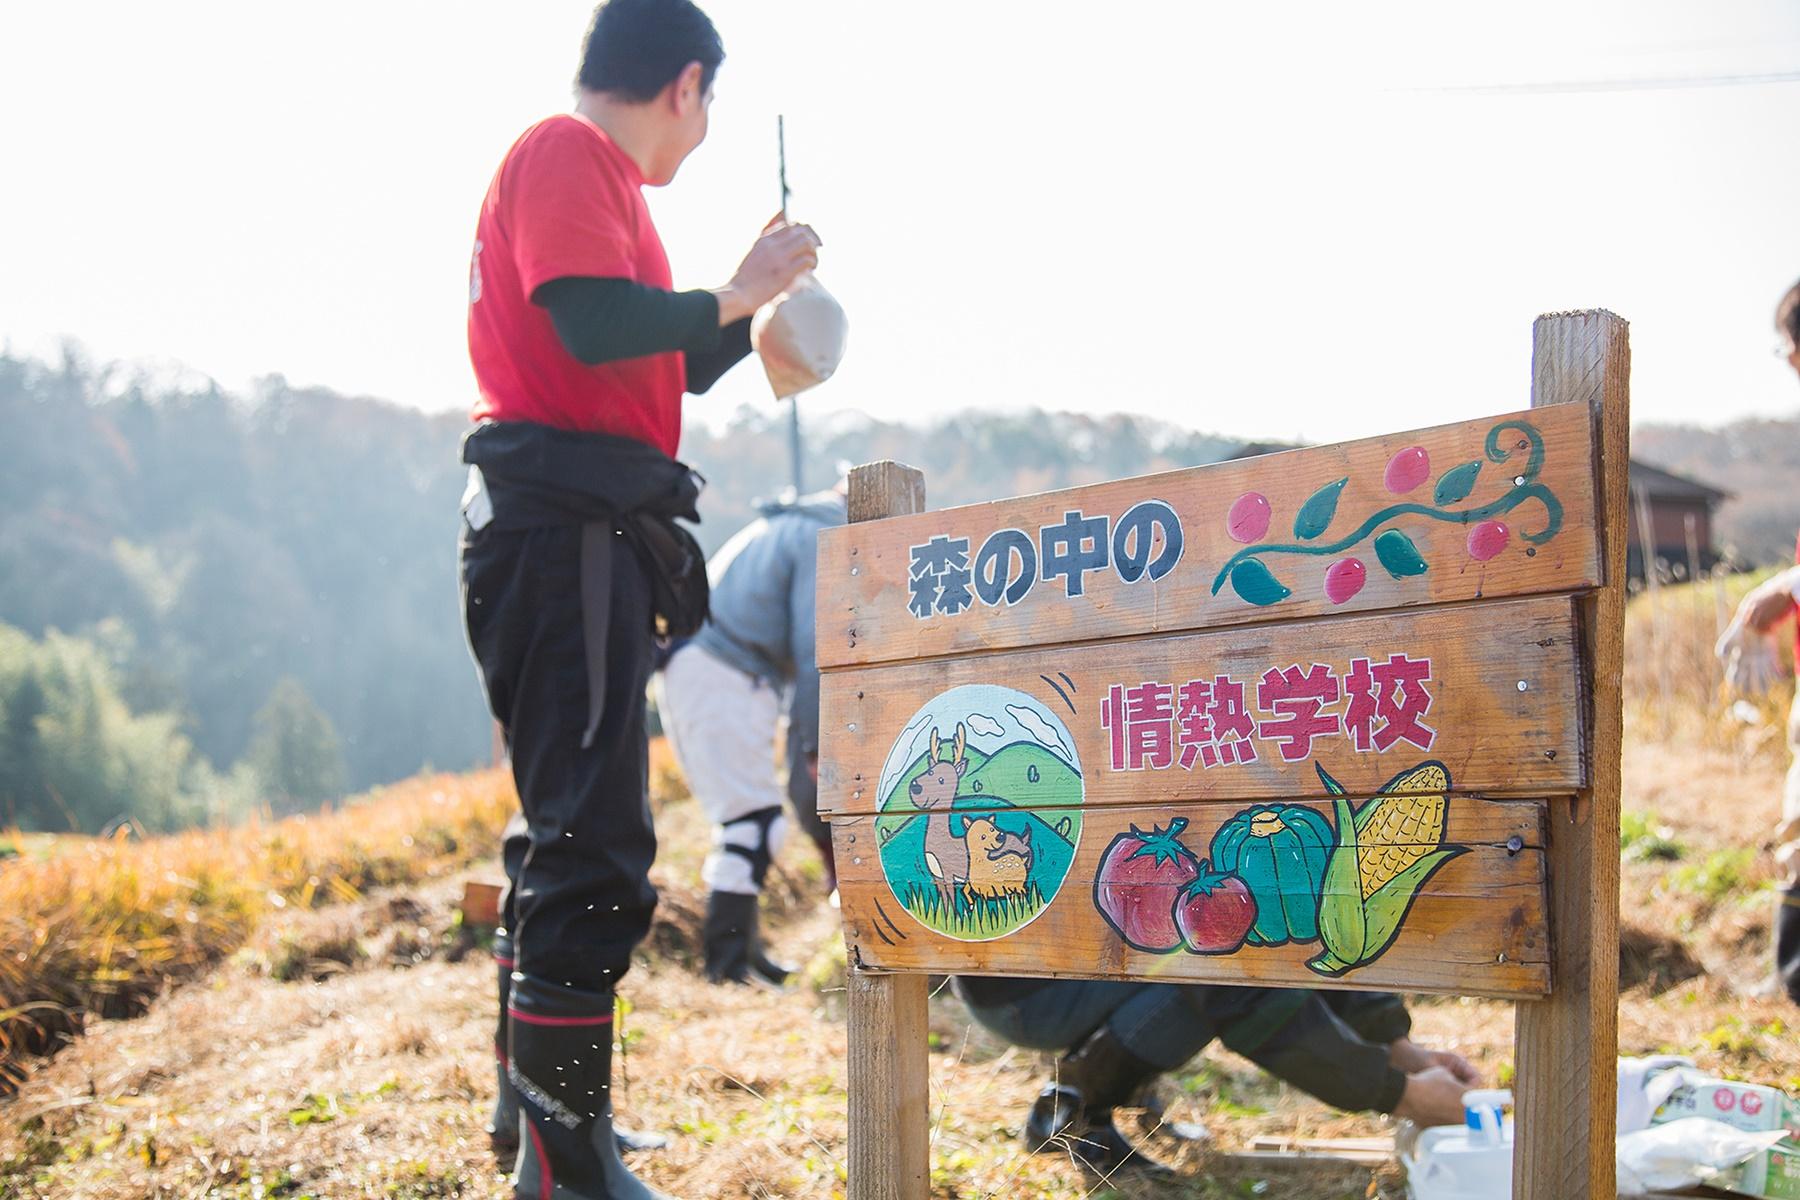 NPOで立ち上げた里山コミュニティー『森の中の情熱学校』 自然農と里山でのアクティビティーを親子で楽しむ。 仲間を募集中!!